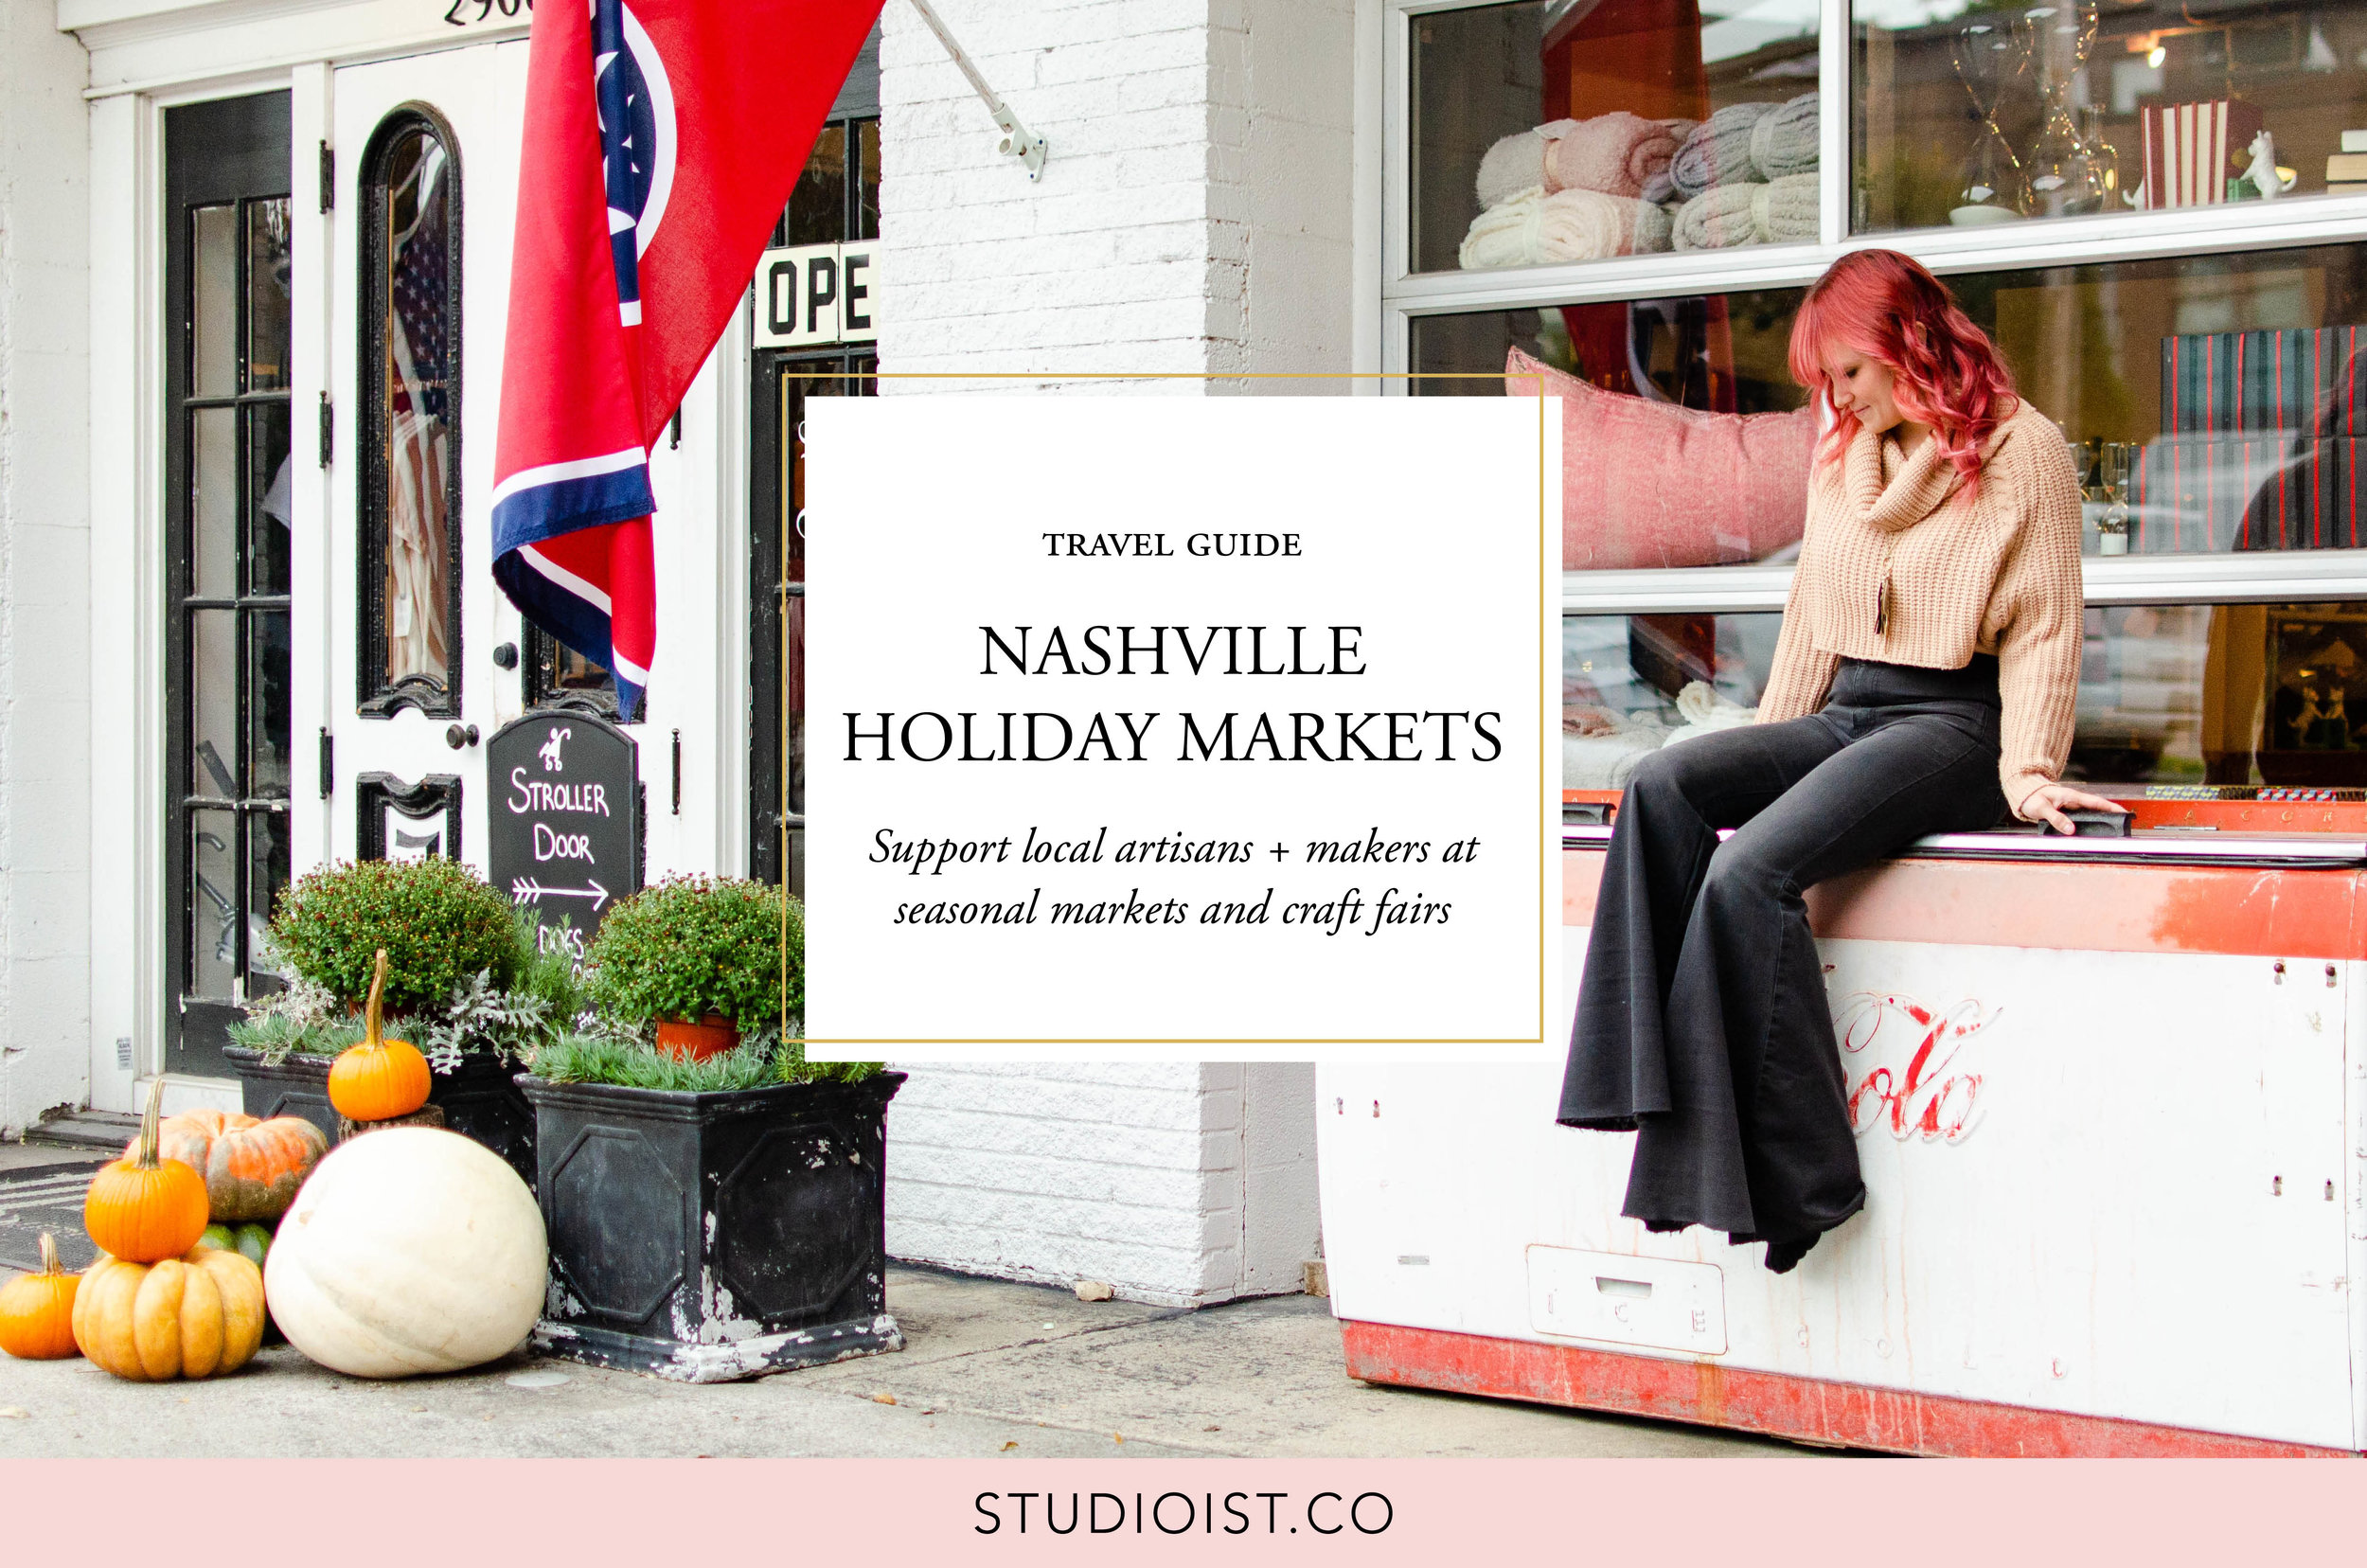 Studioist_Food Cover Photos_Nashville Holiday Markets 2018.jpg